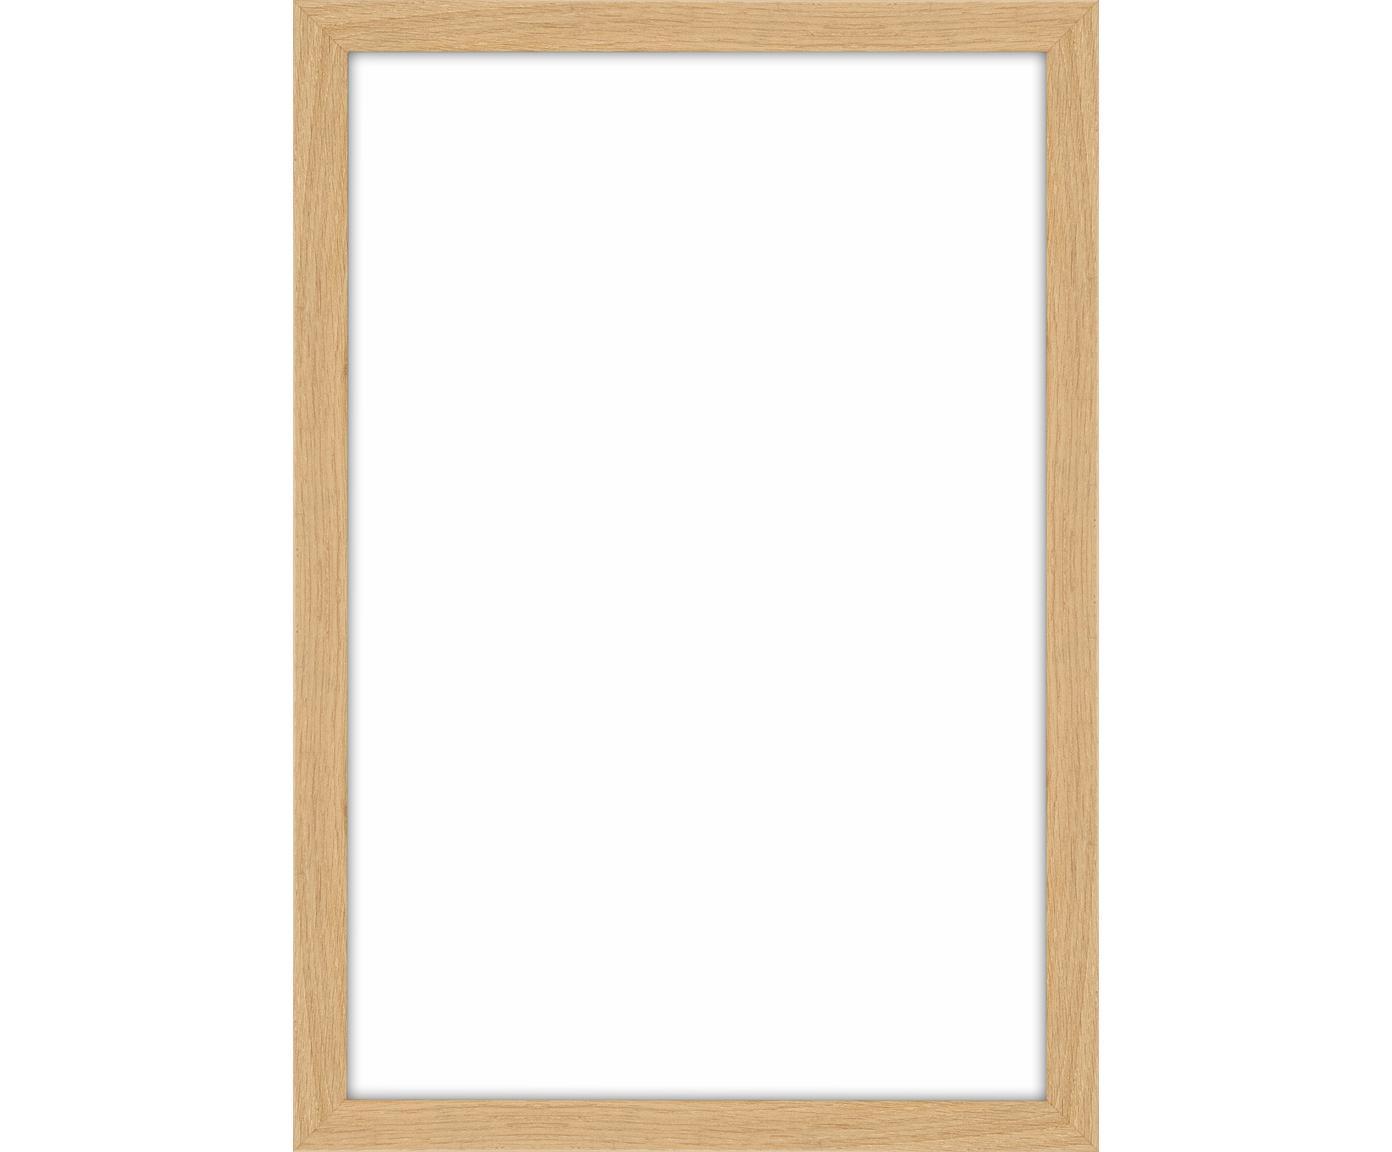 Fotolijstje Duo, Lijst: aluminium, folie, Lichtbruin, 10 x 15 cm